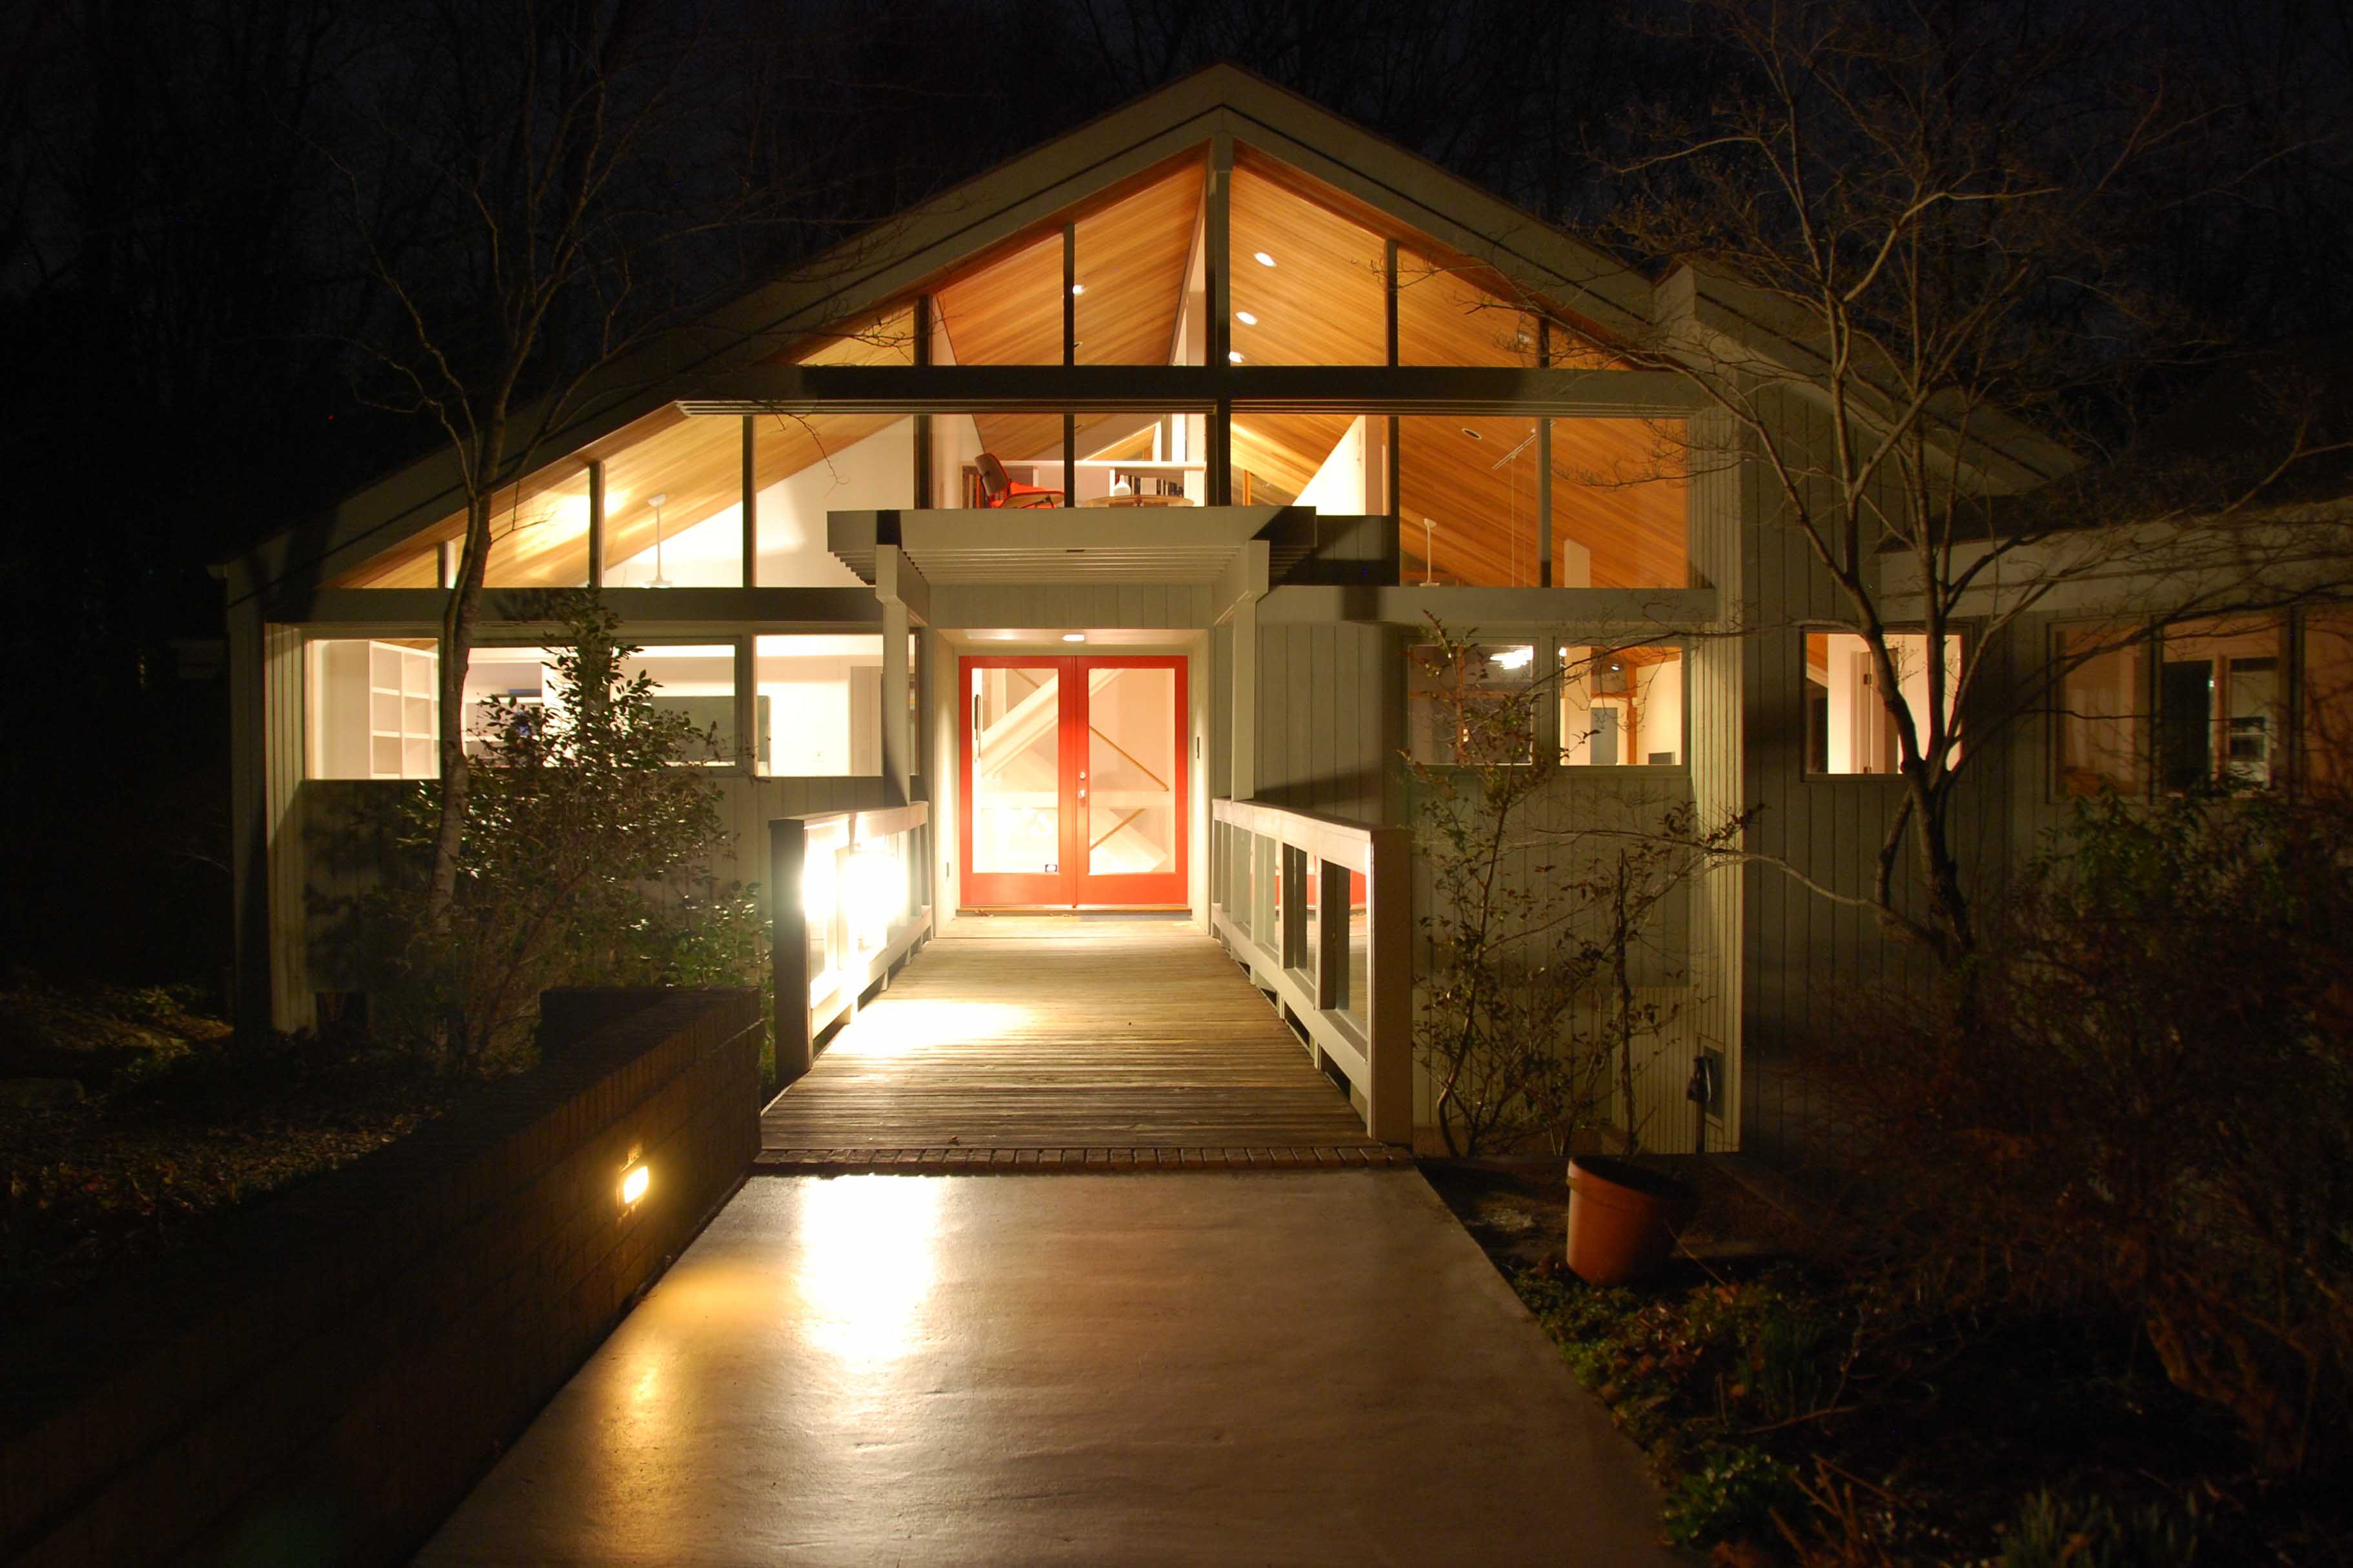 Chapel Hill Renovation Front Exterior at Night